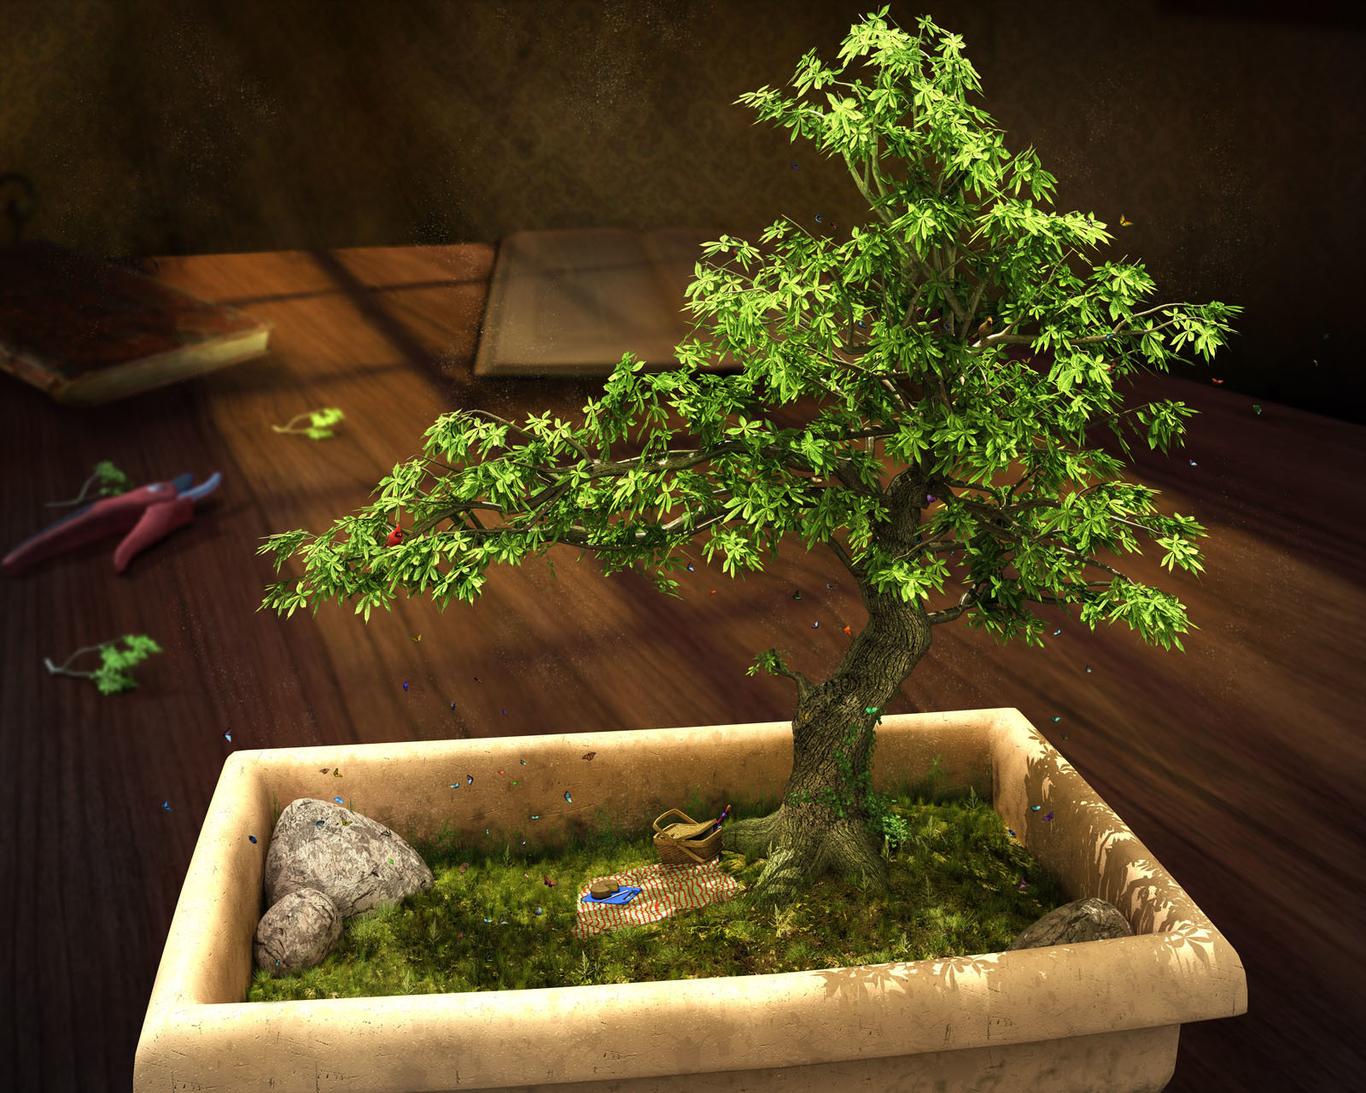 Chrislomaka giants bonsai interi 1 15b15b14 pqwg